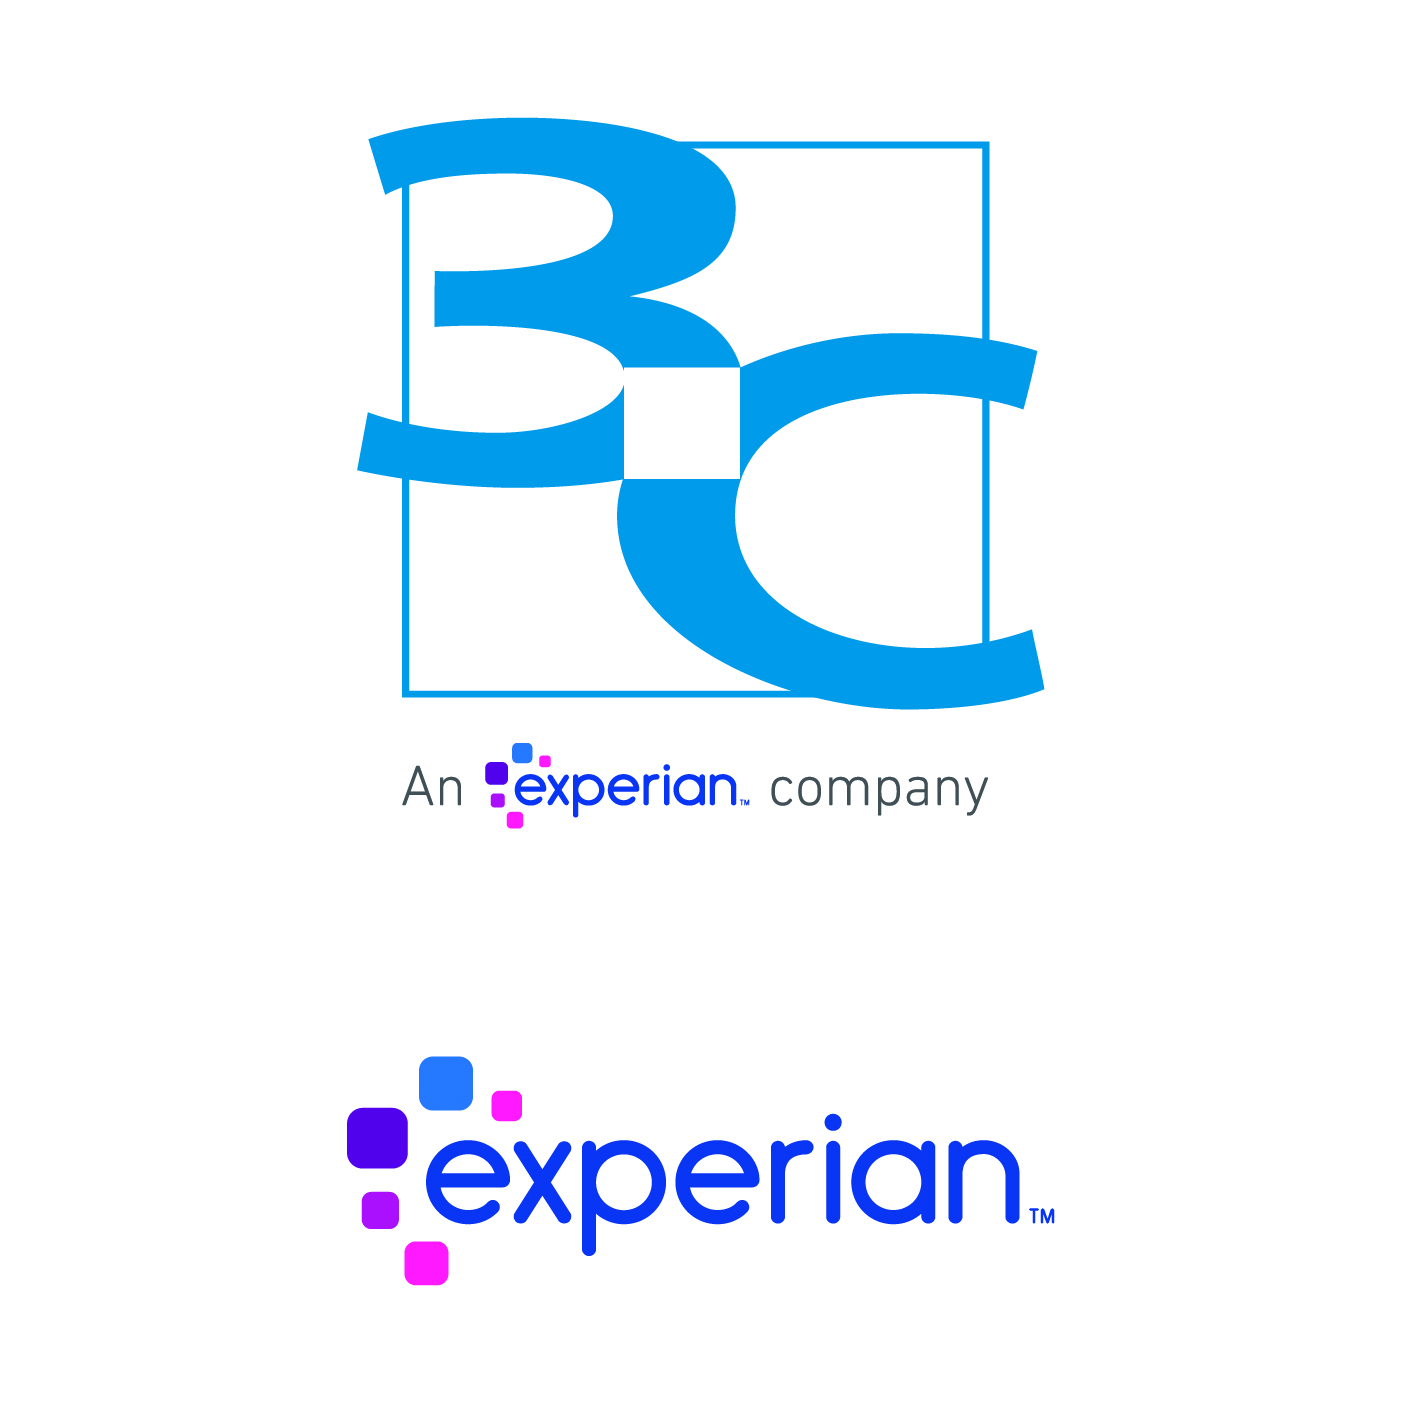 Partner: 3C_kombilogo-vertikal-experian.jpg